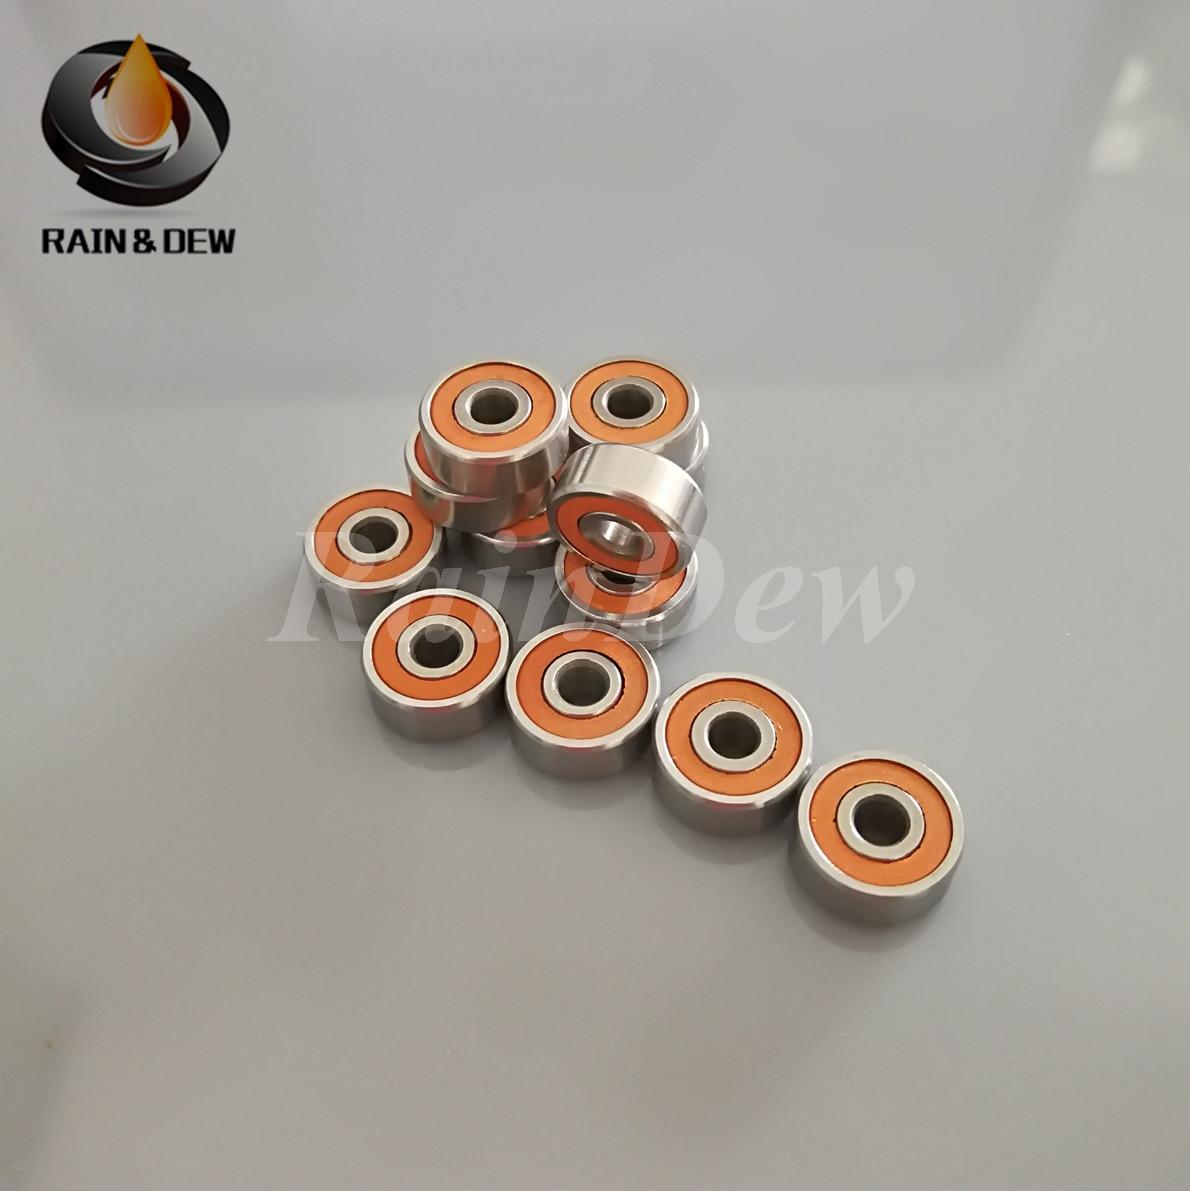 ABEC-7 HYBRID CERAMIC Orange Seal spool bearings 5x11x4 /& 3x8x4